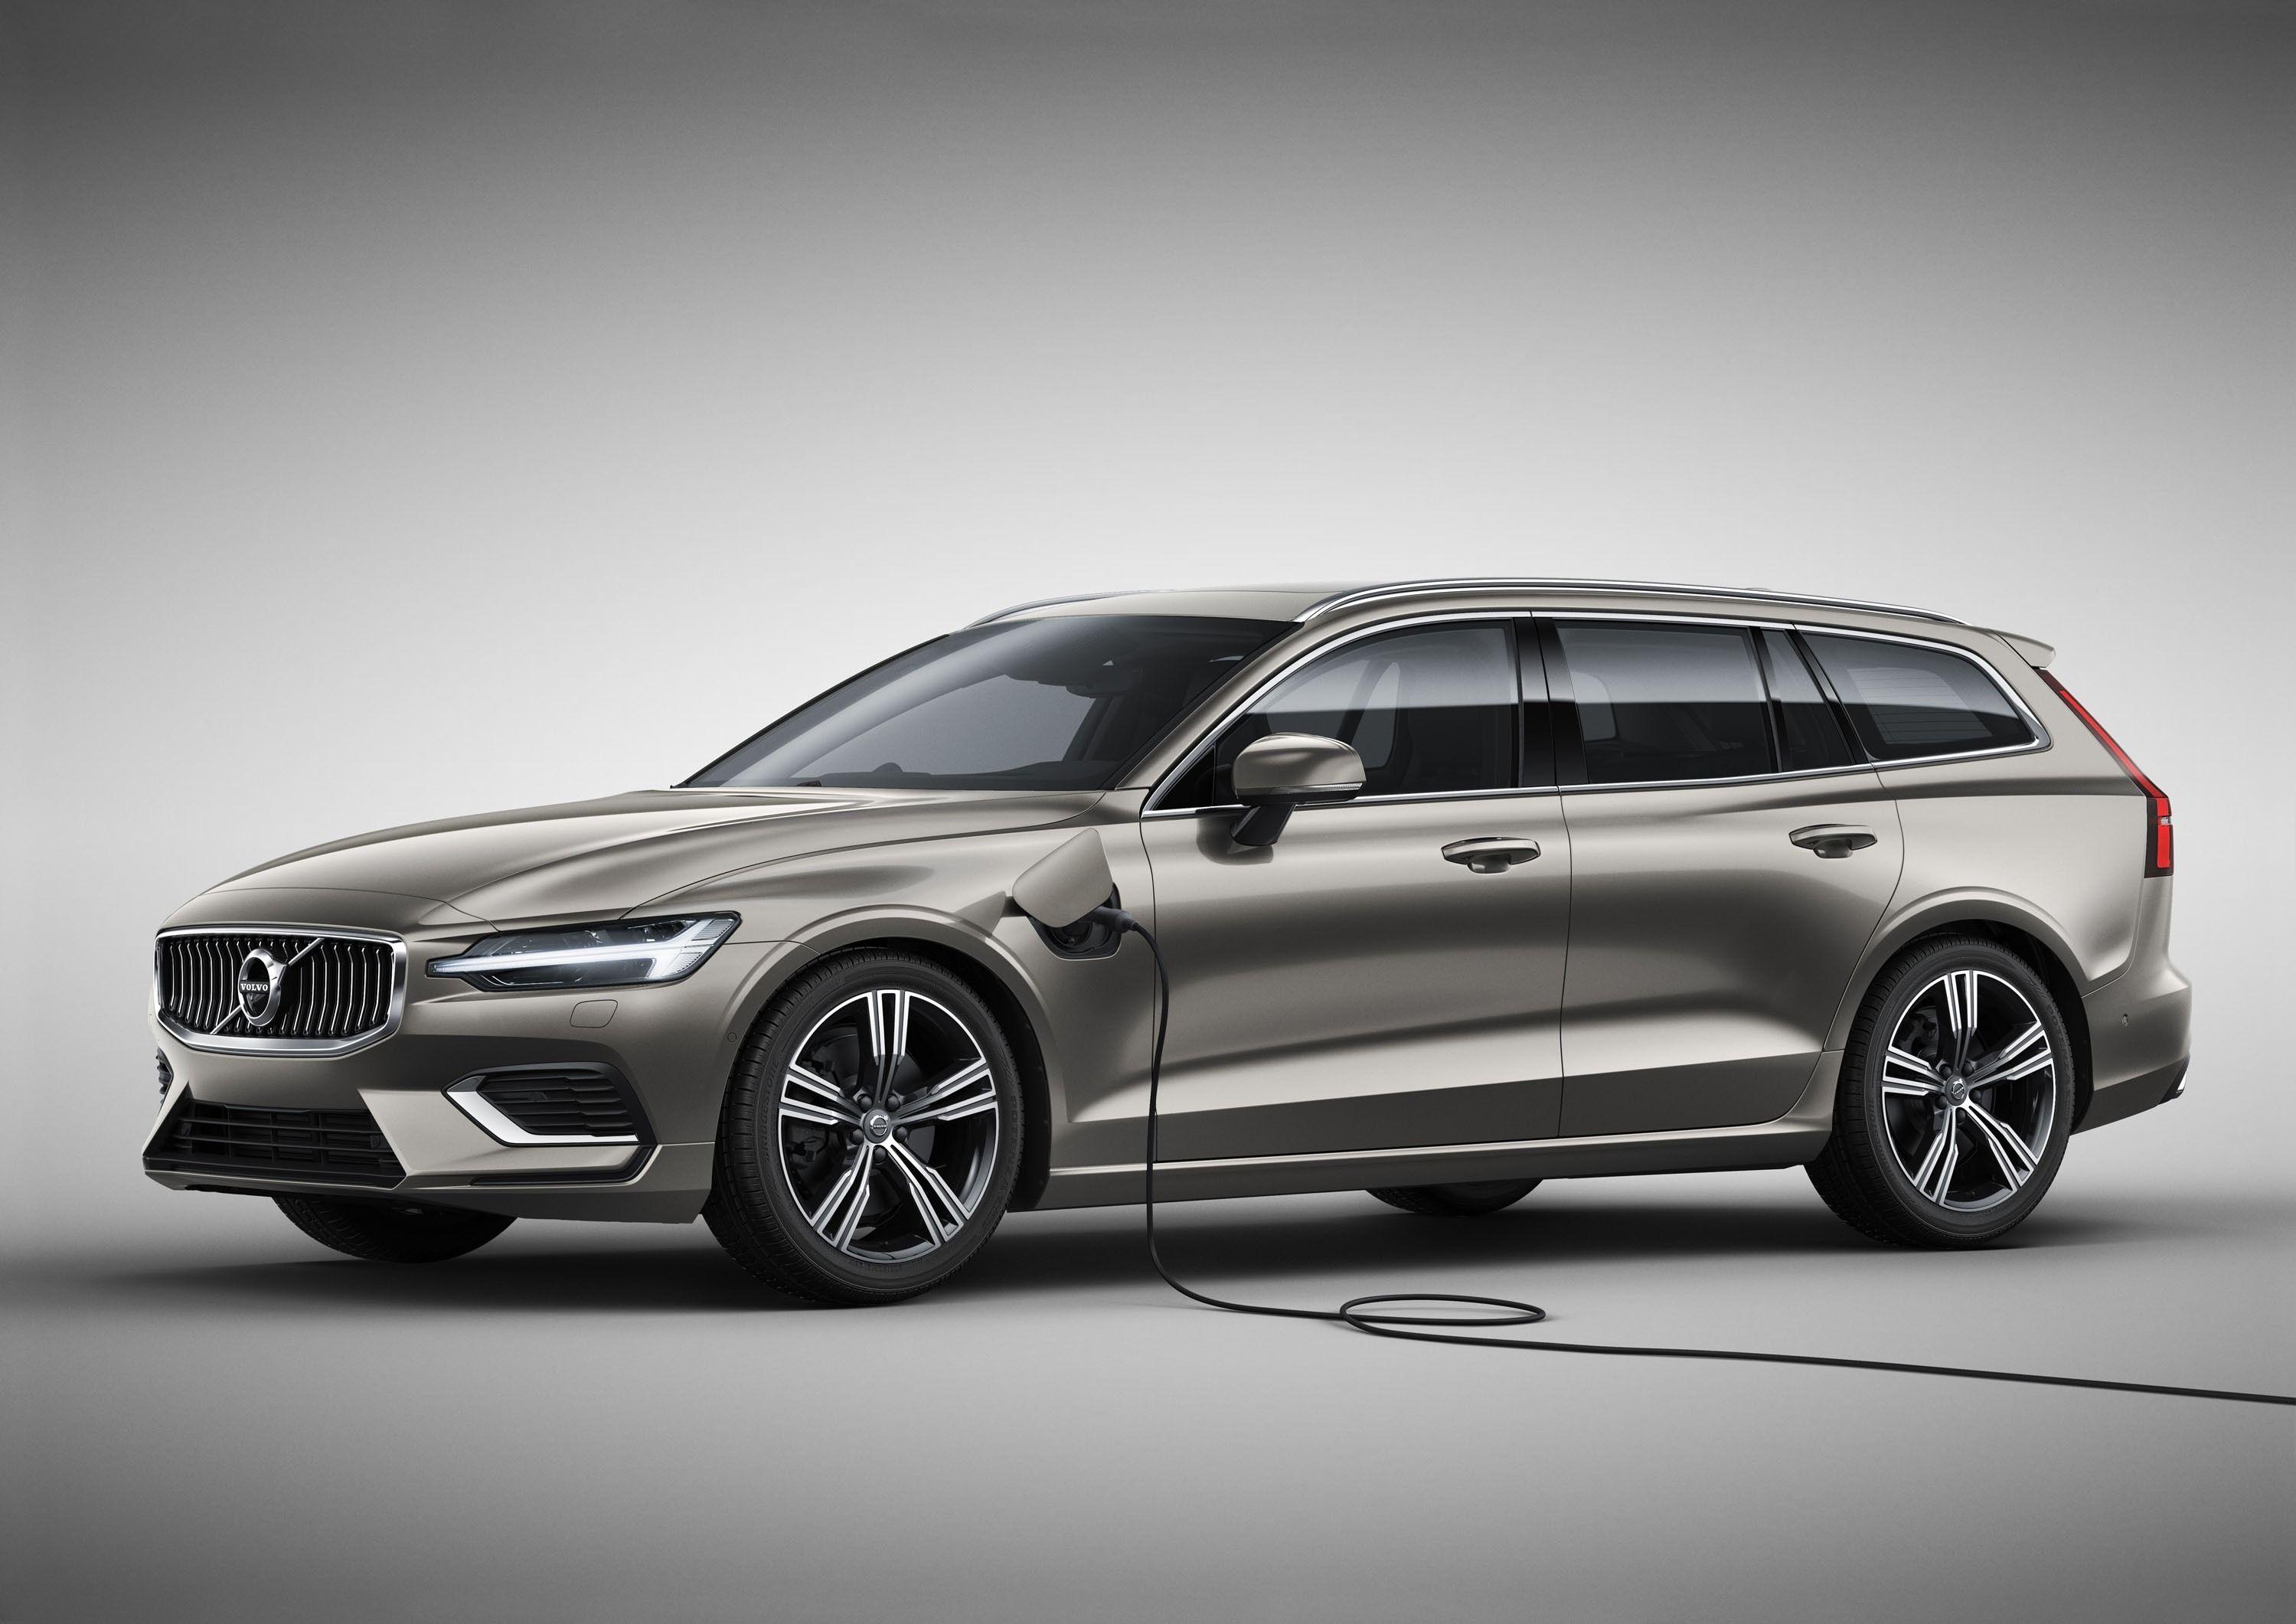 2020 Volvo Xc70 New Generation Wagon Rumors